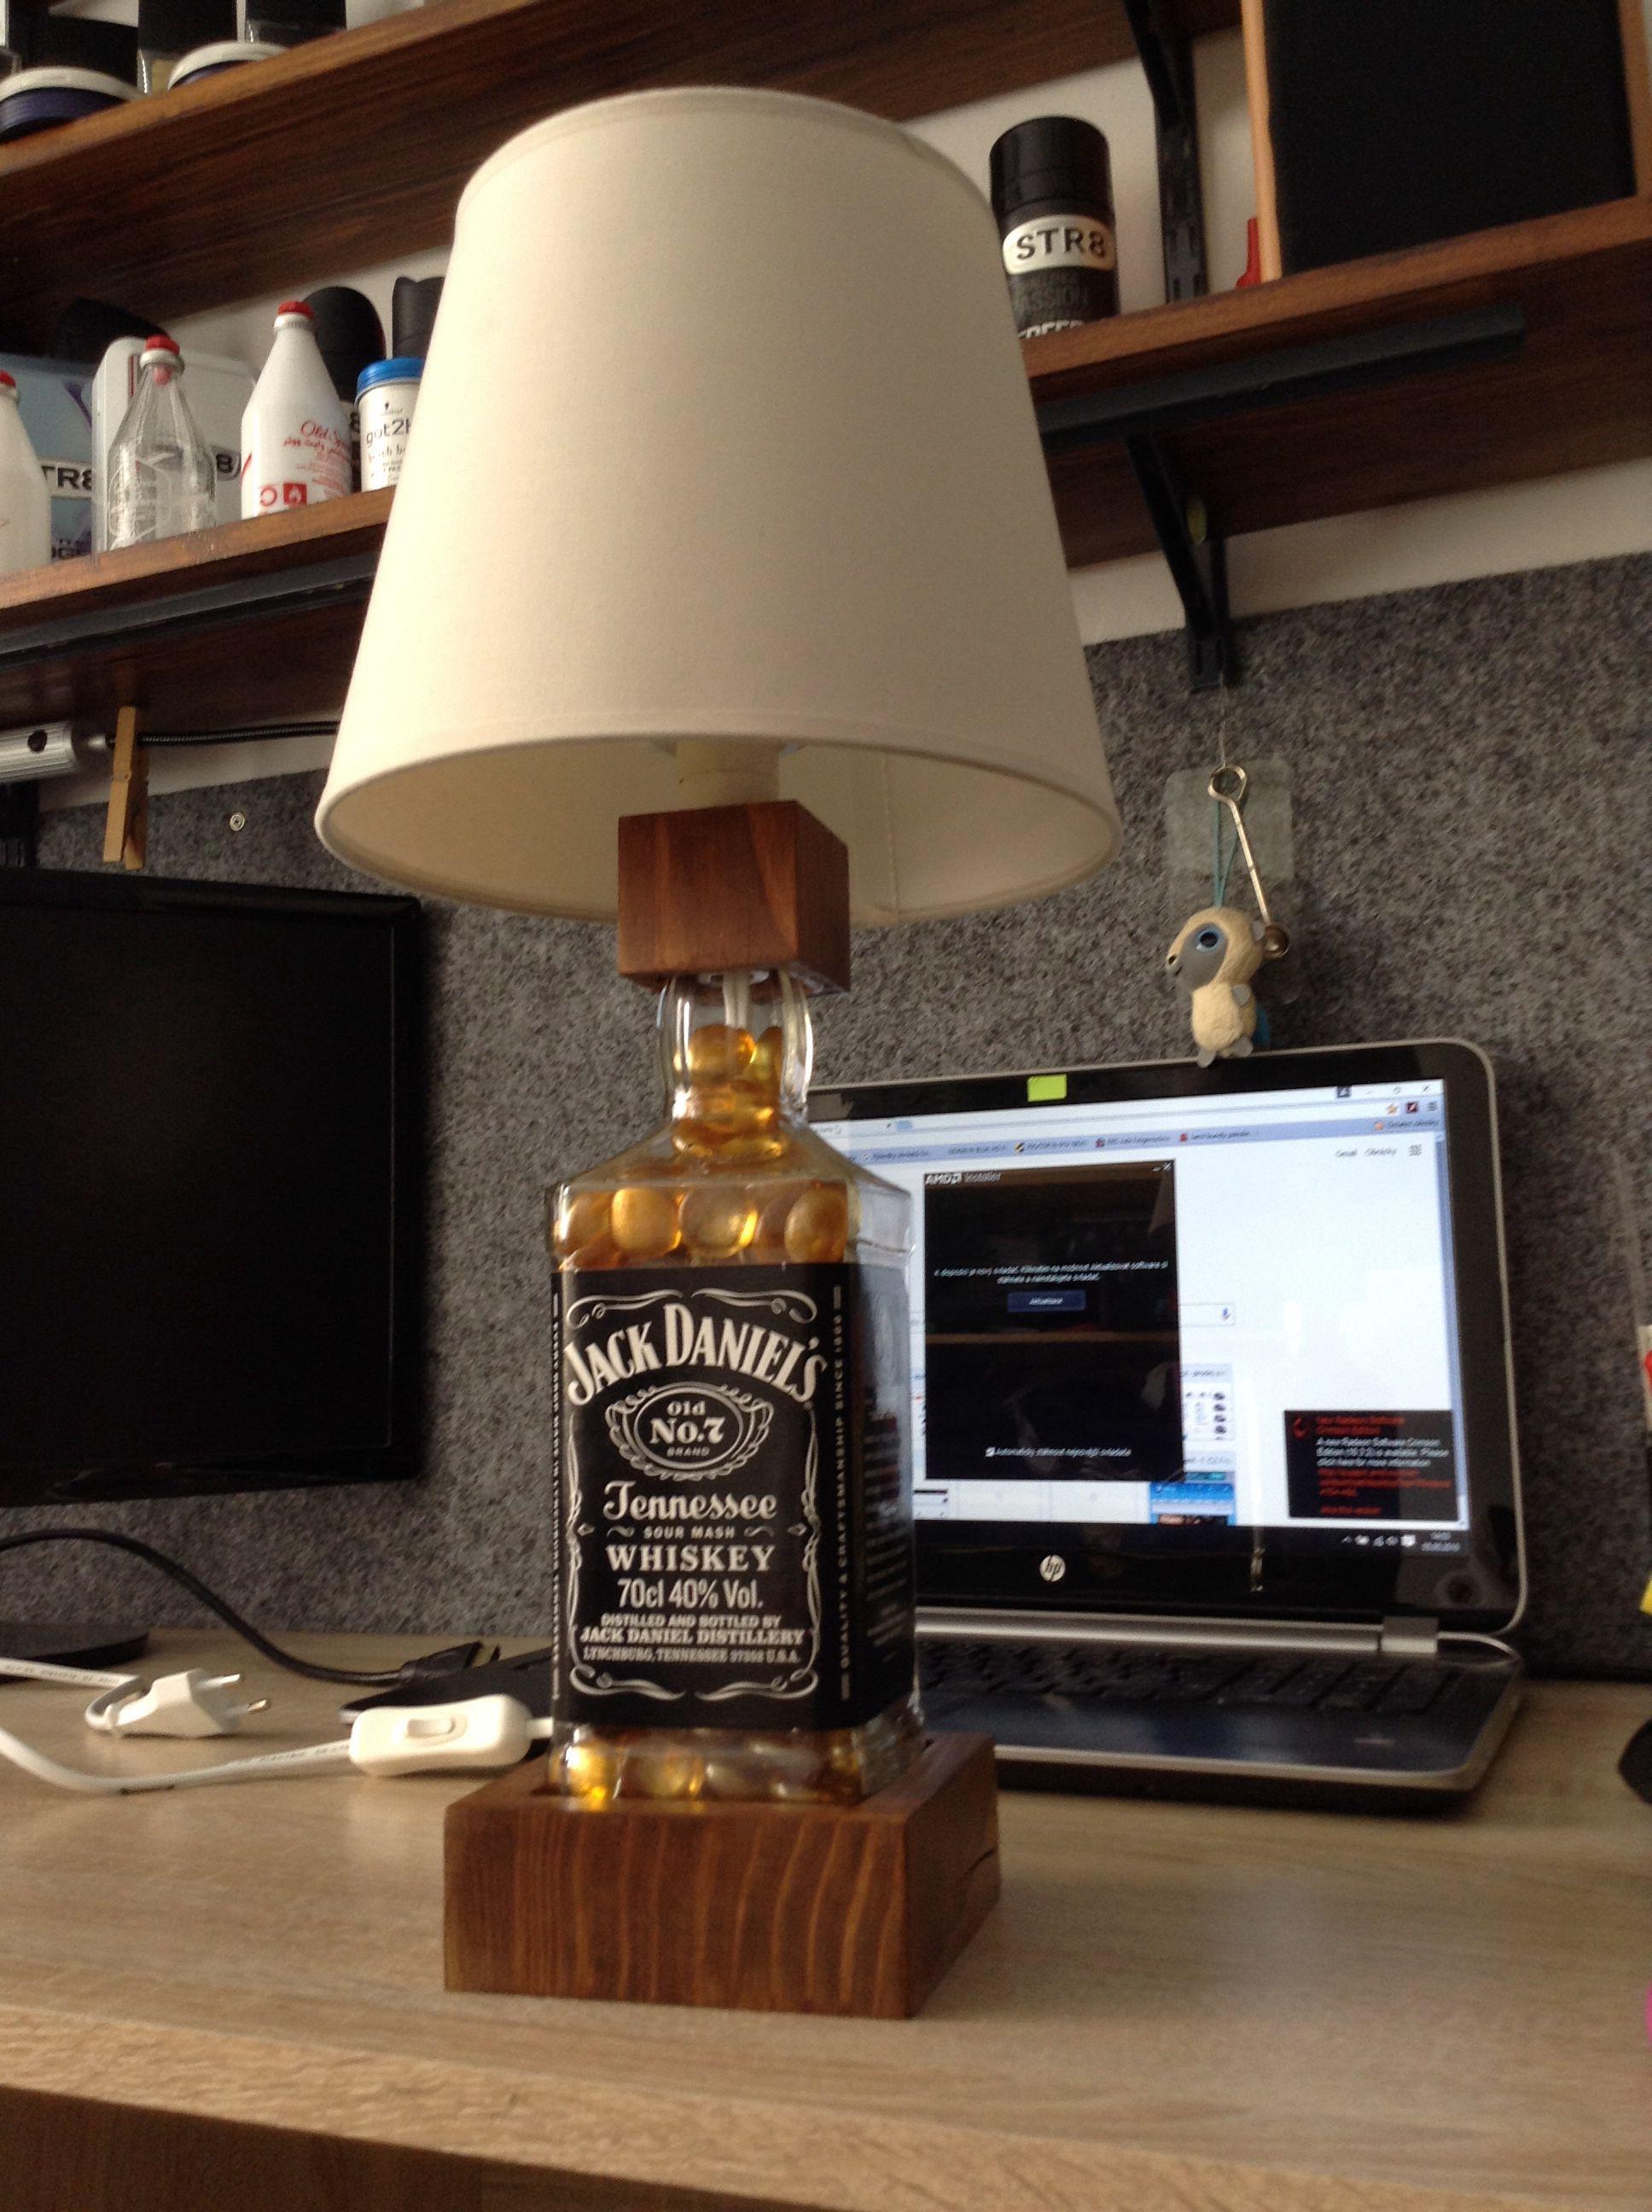 Complete jack daniels bottle lamp bottlelamp bottle lamp complete jack daniels bottle lamp bottlelamp aloadofball Gallery